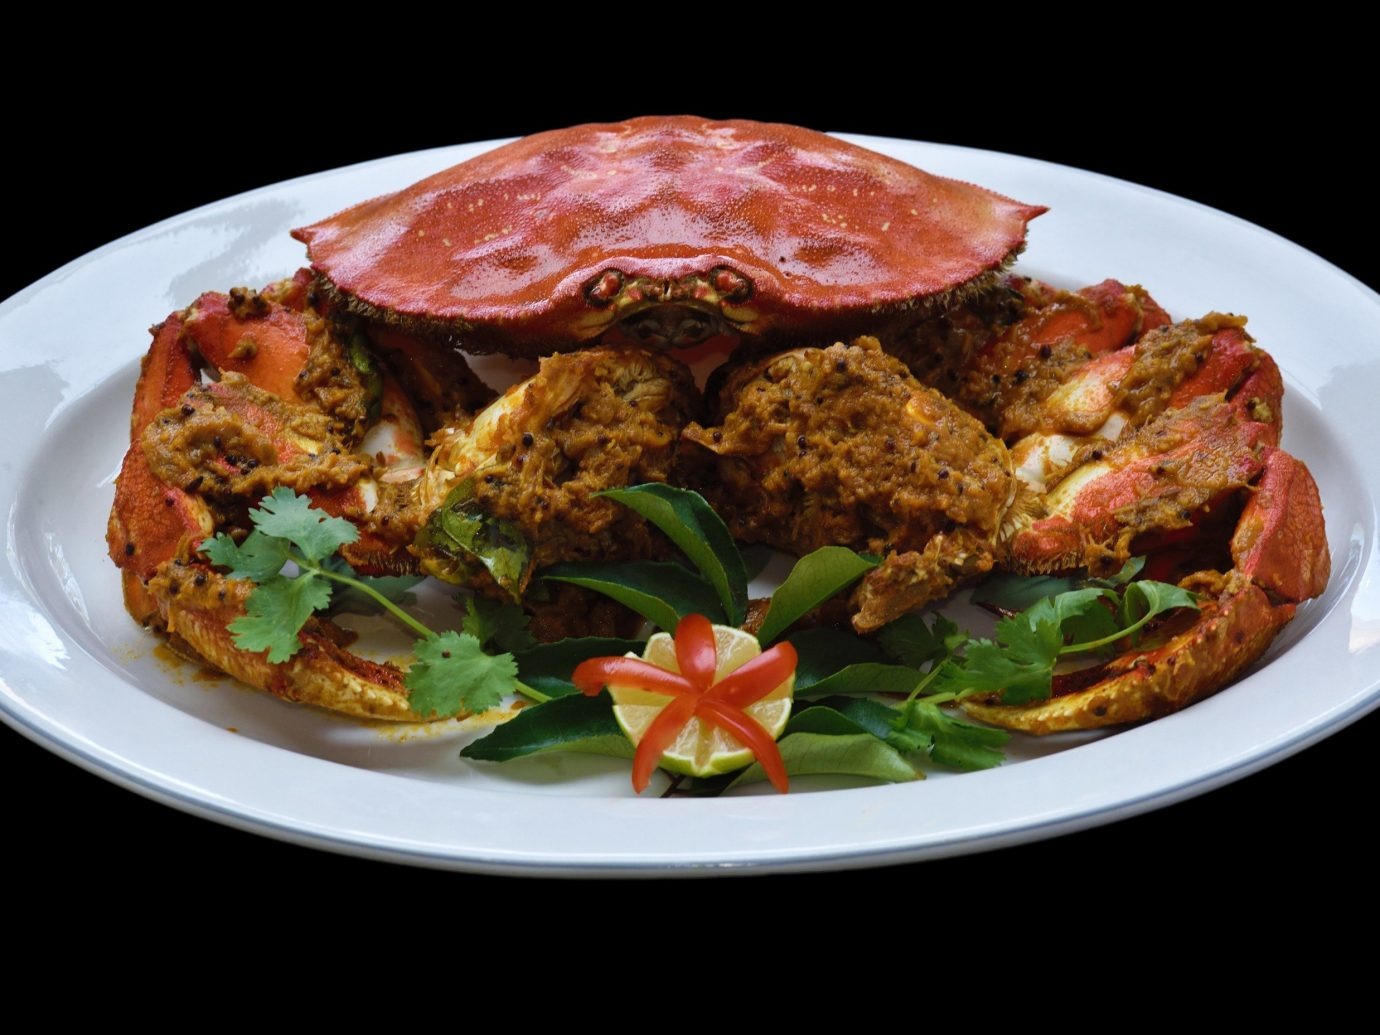 Food + Drink plate food table dish meal cuisine Seafood fried food meat produce tandoori chicken snack food piece de resistance